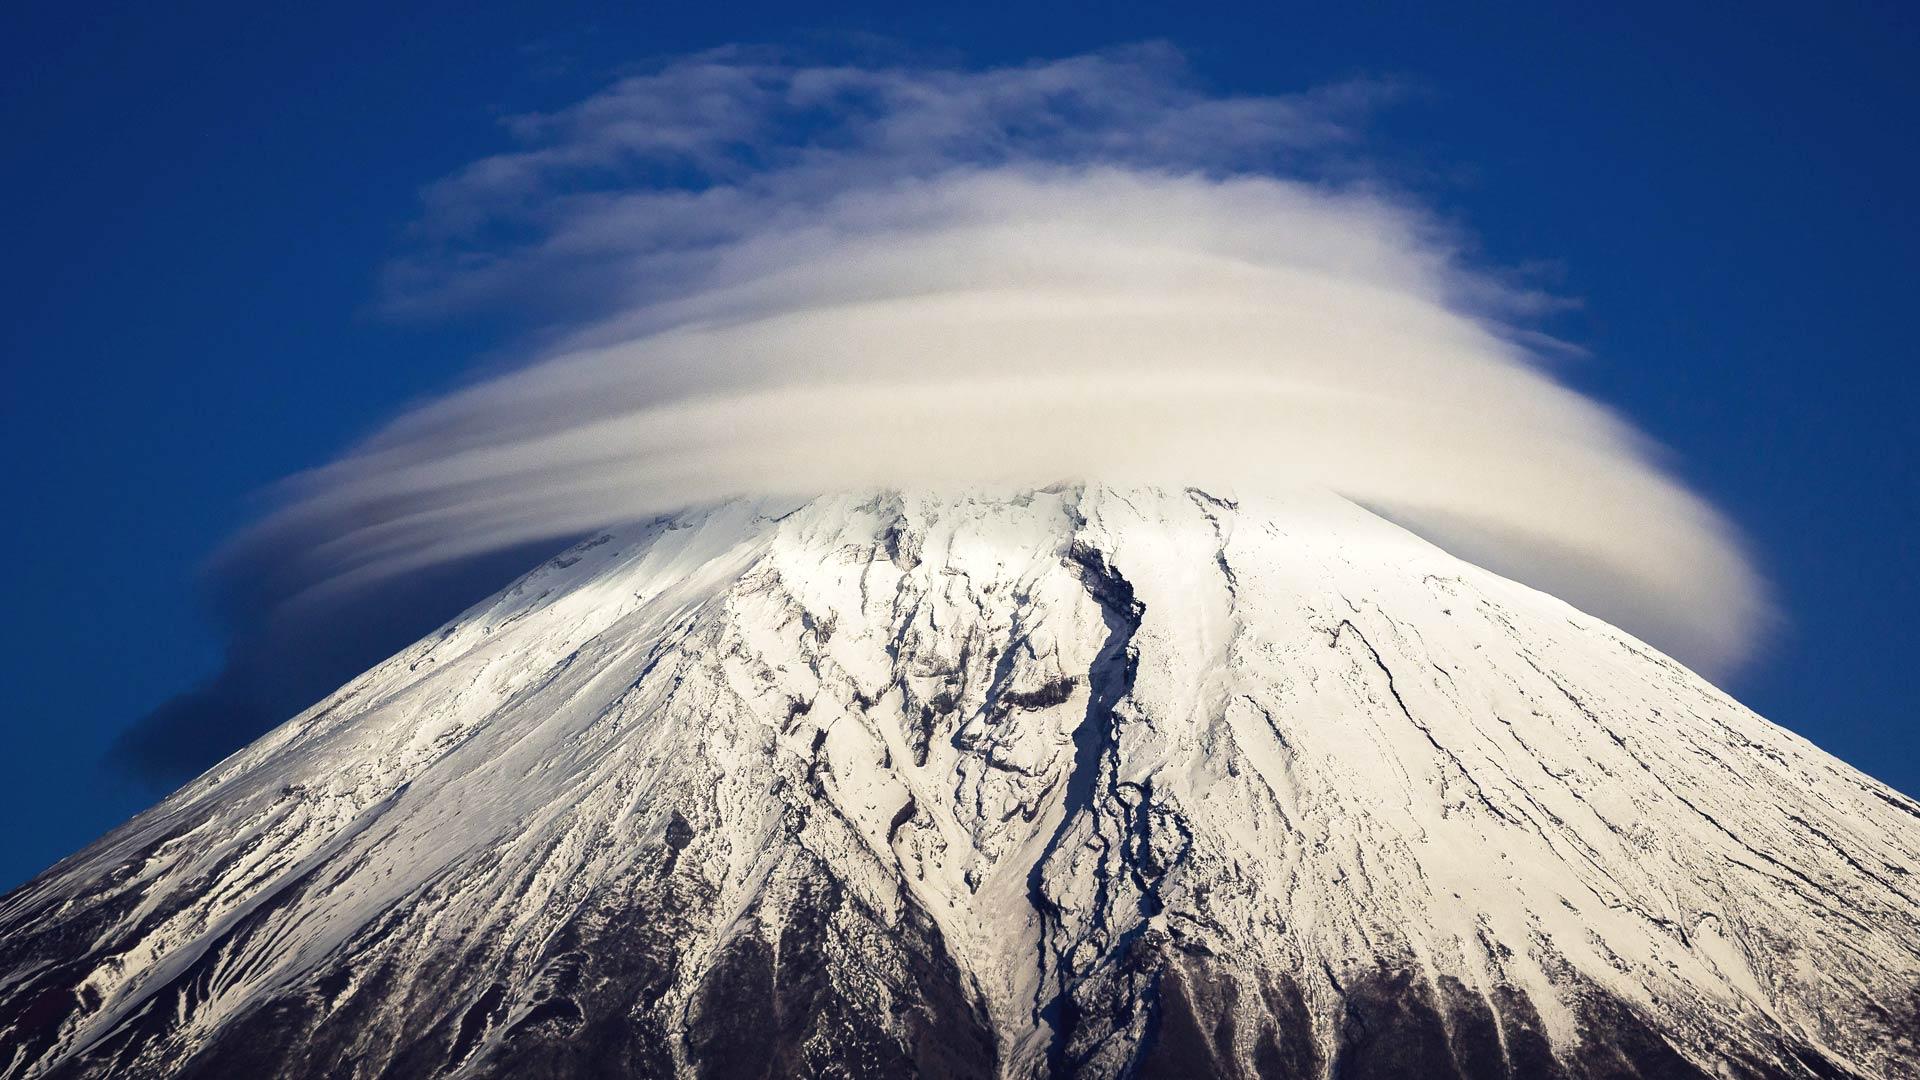 Fuji Cloud